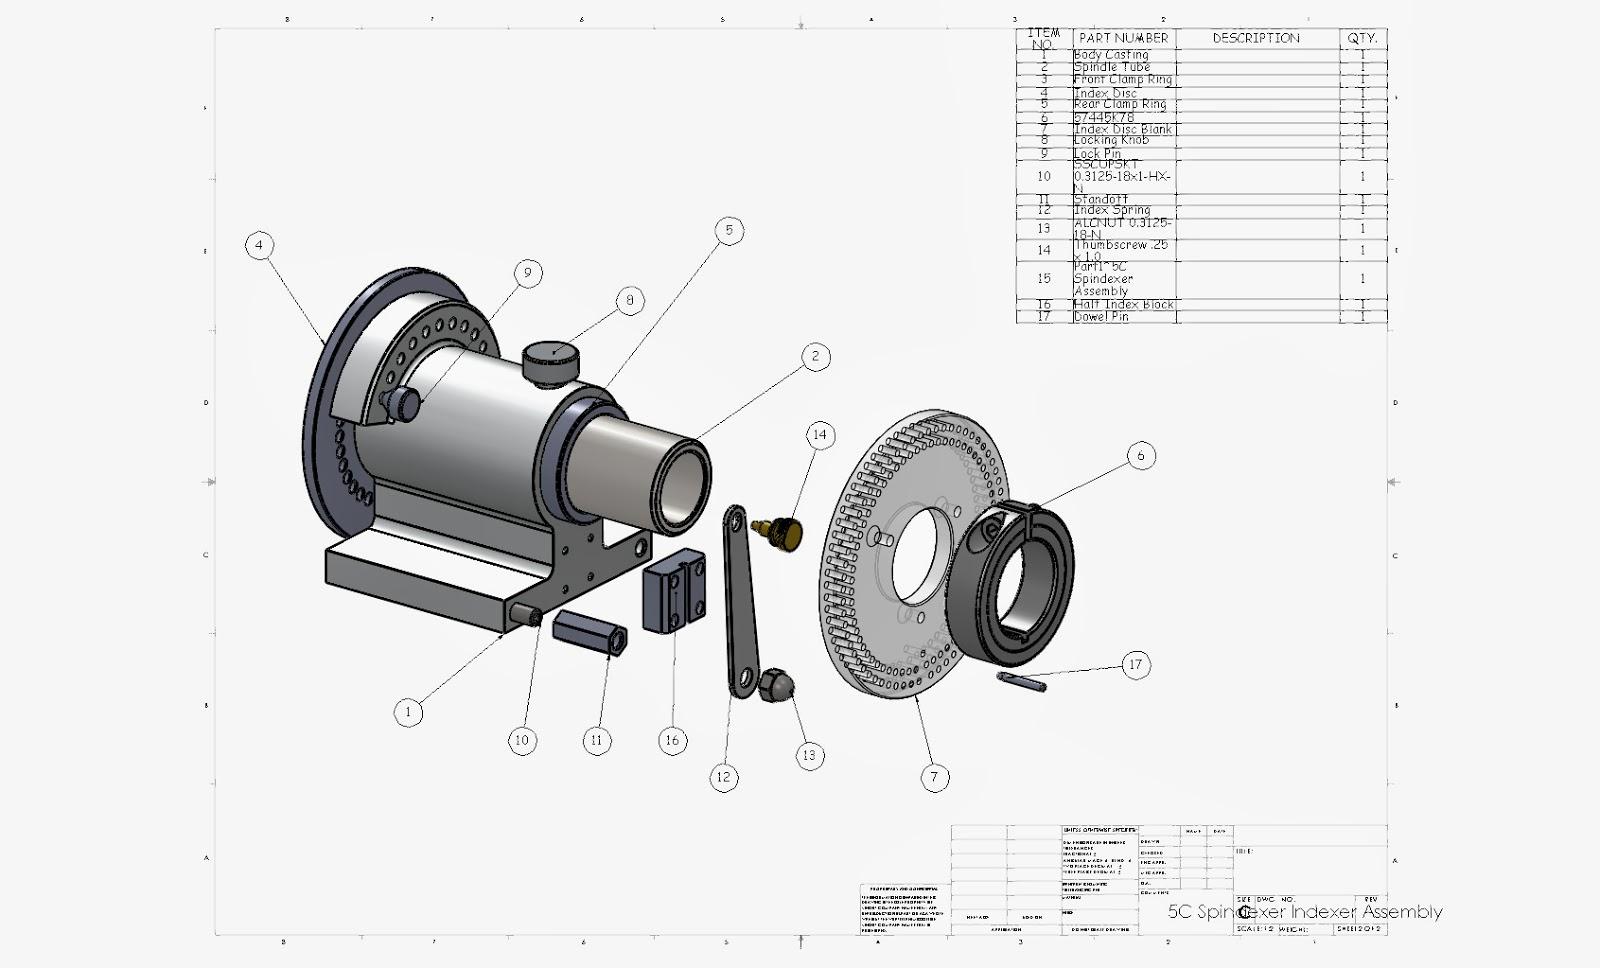 5c collet indexer manual